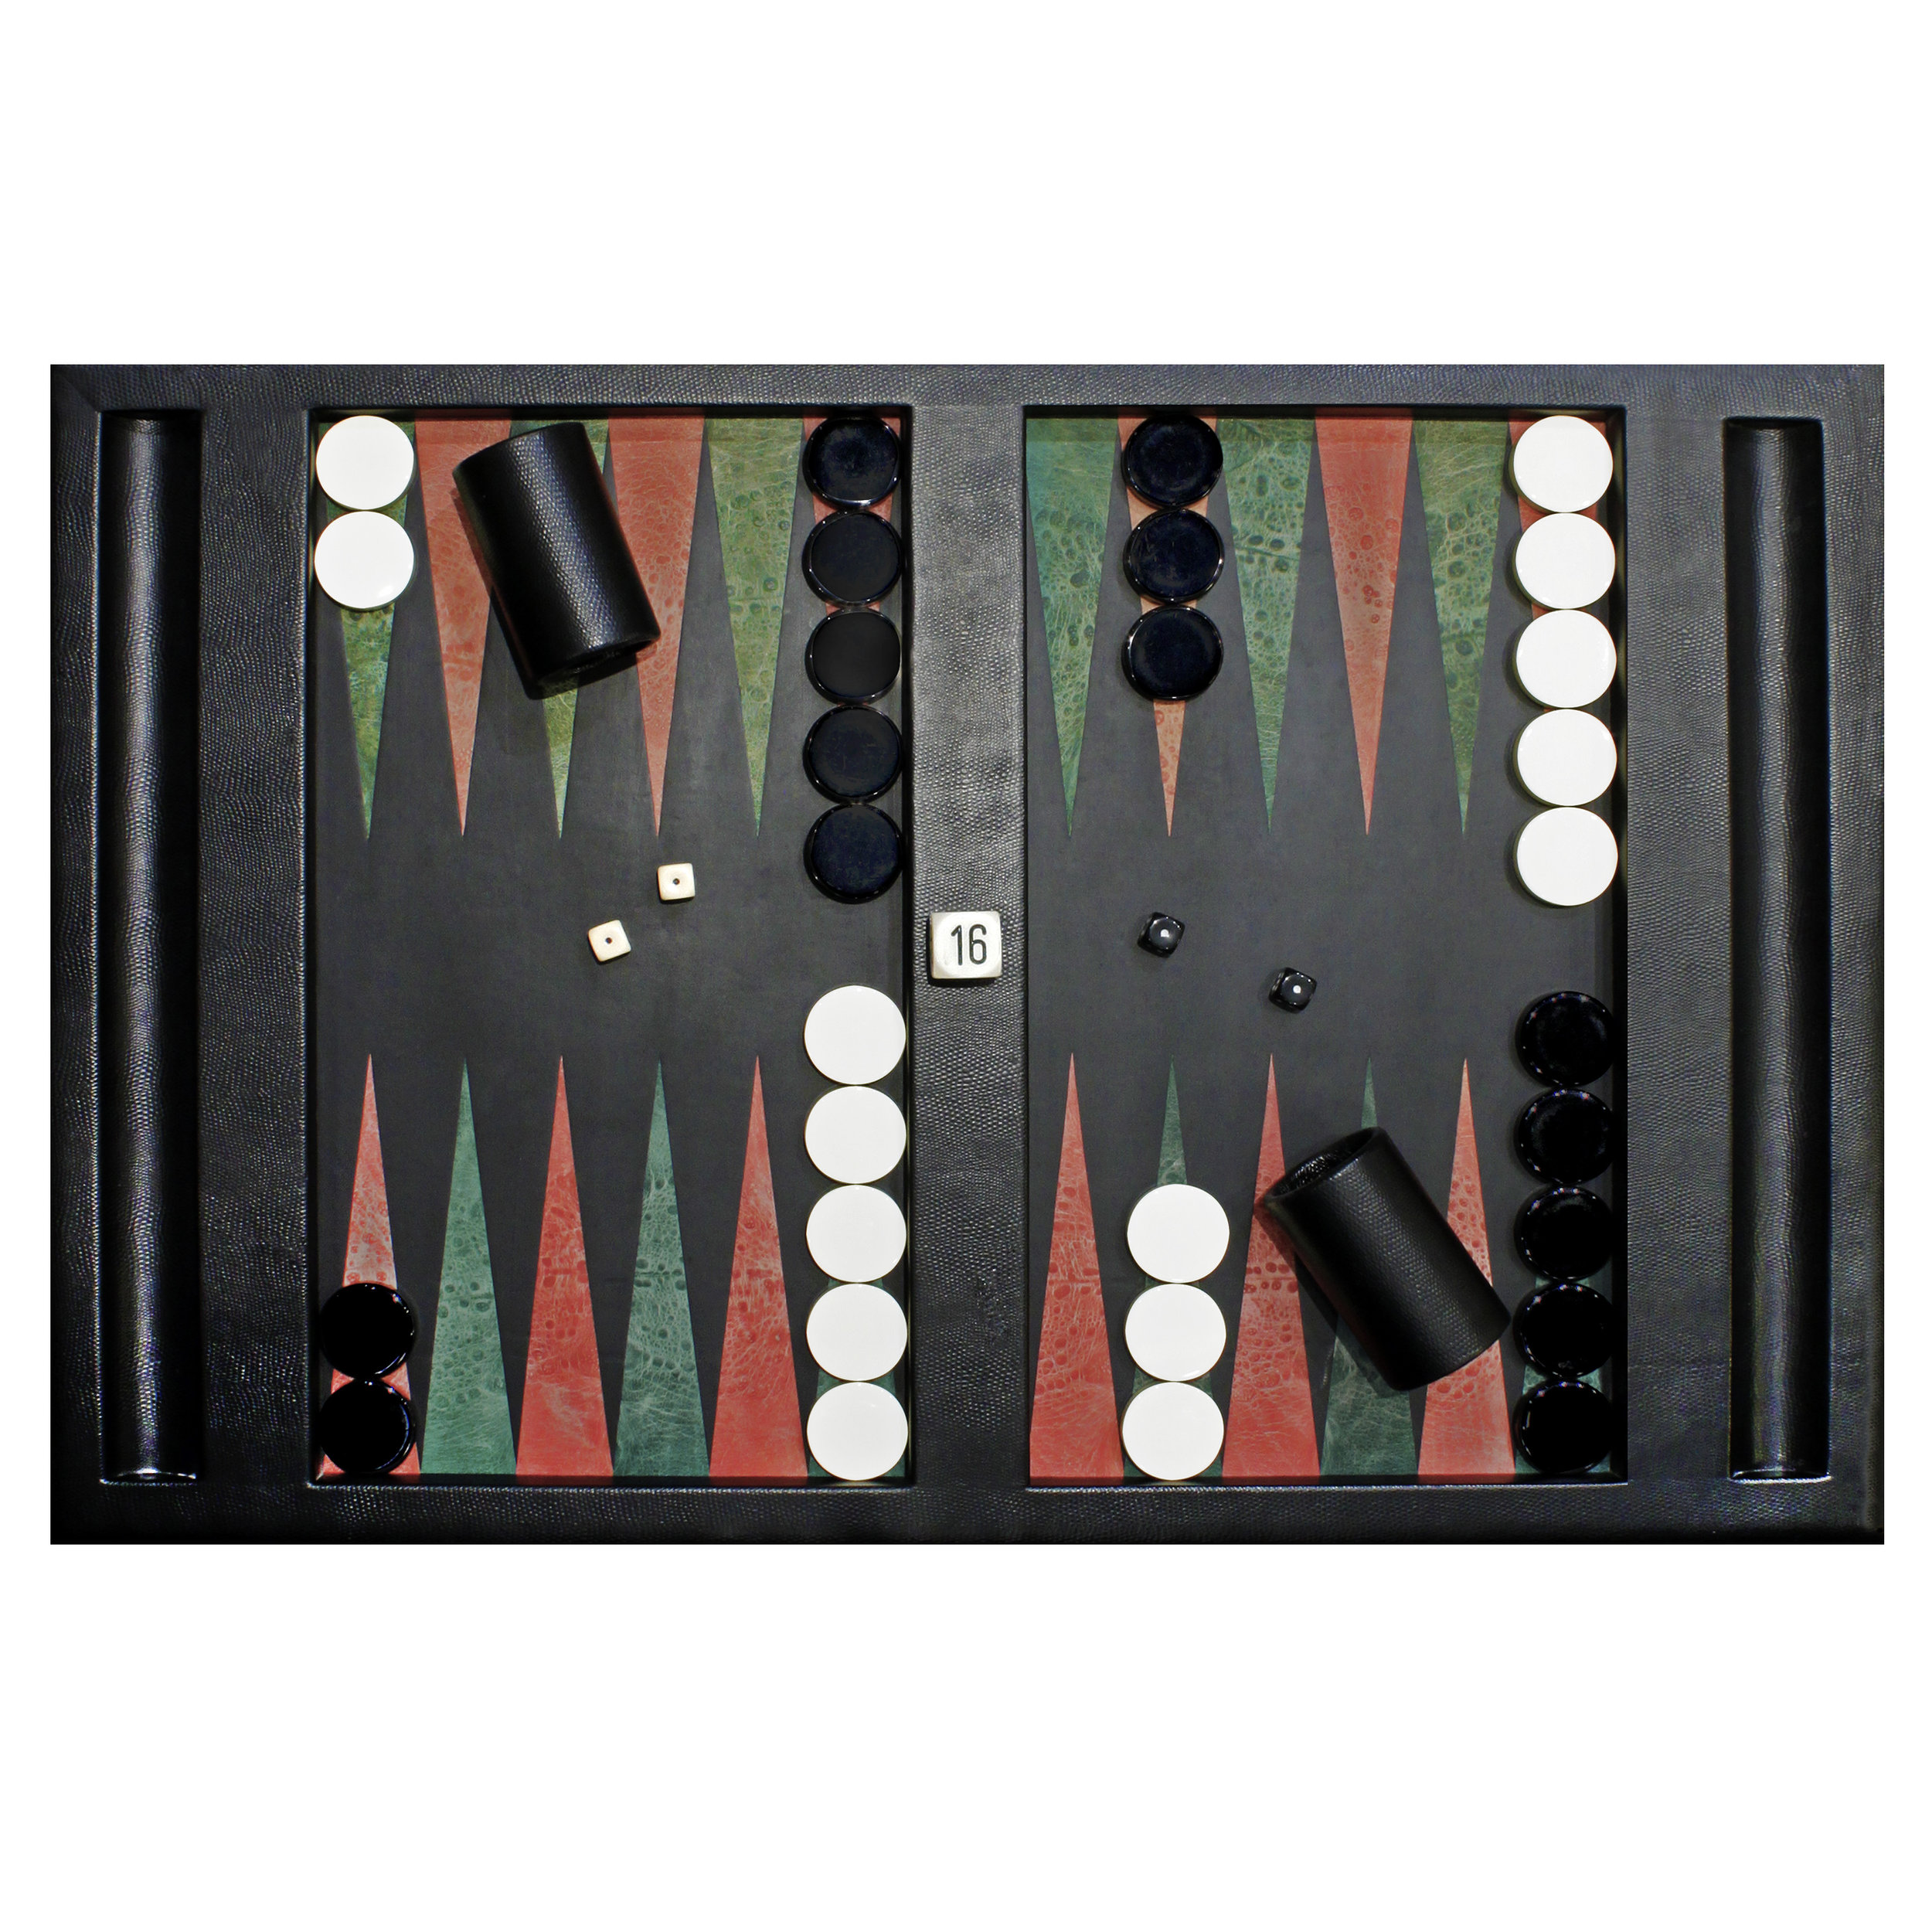 Springer 55 backgammon board gametable49 hires main.jpg